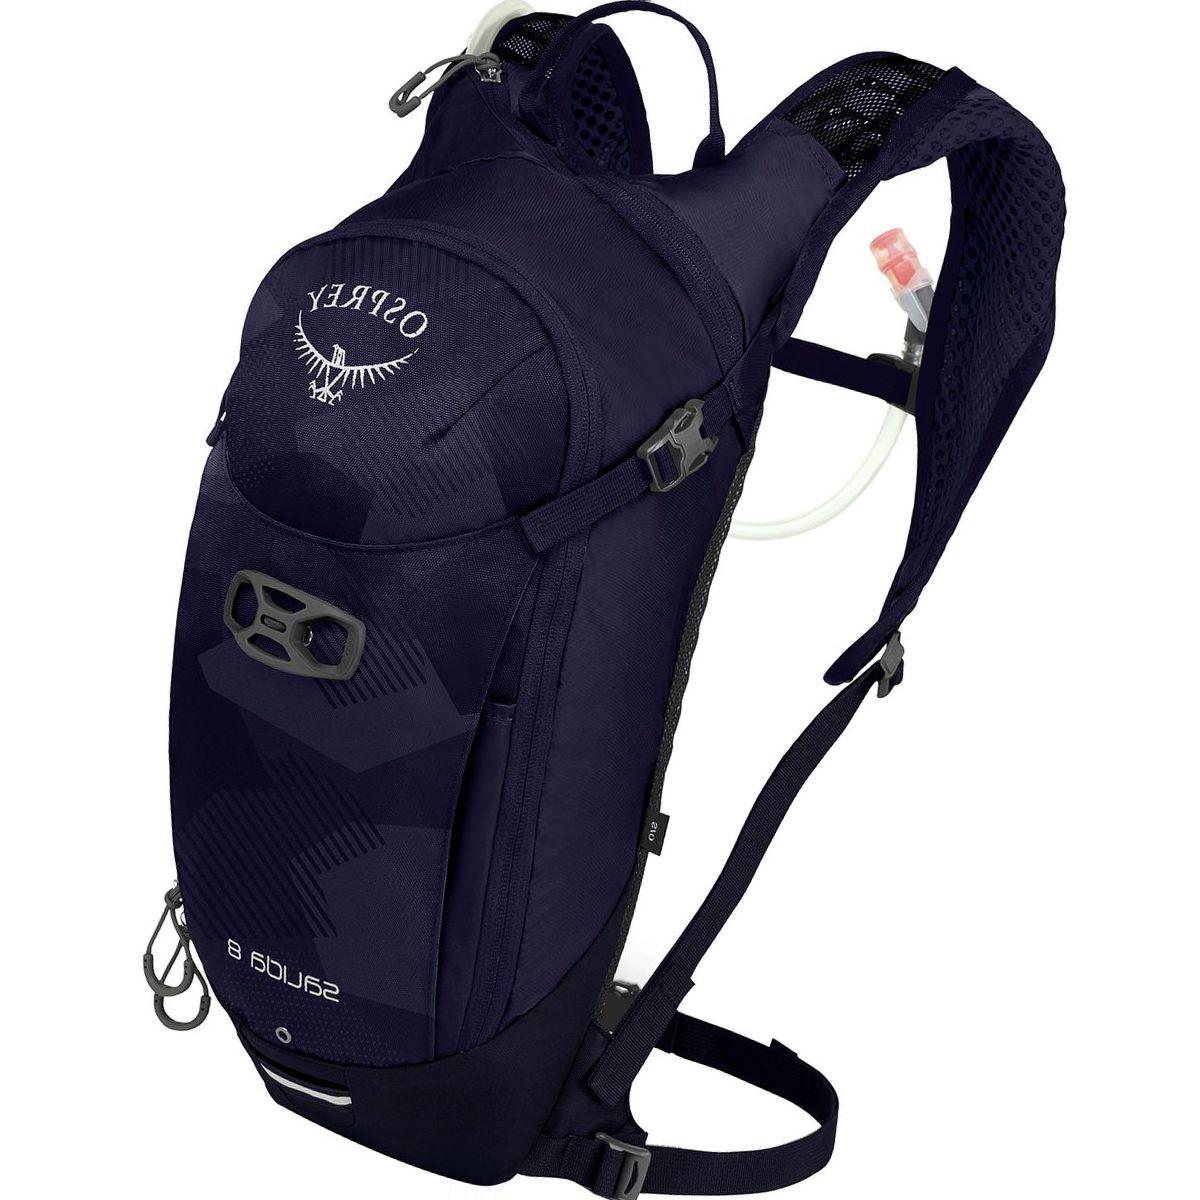 Osprey Packs Salida 8L Backpack - Women's